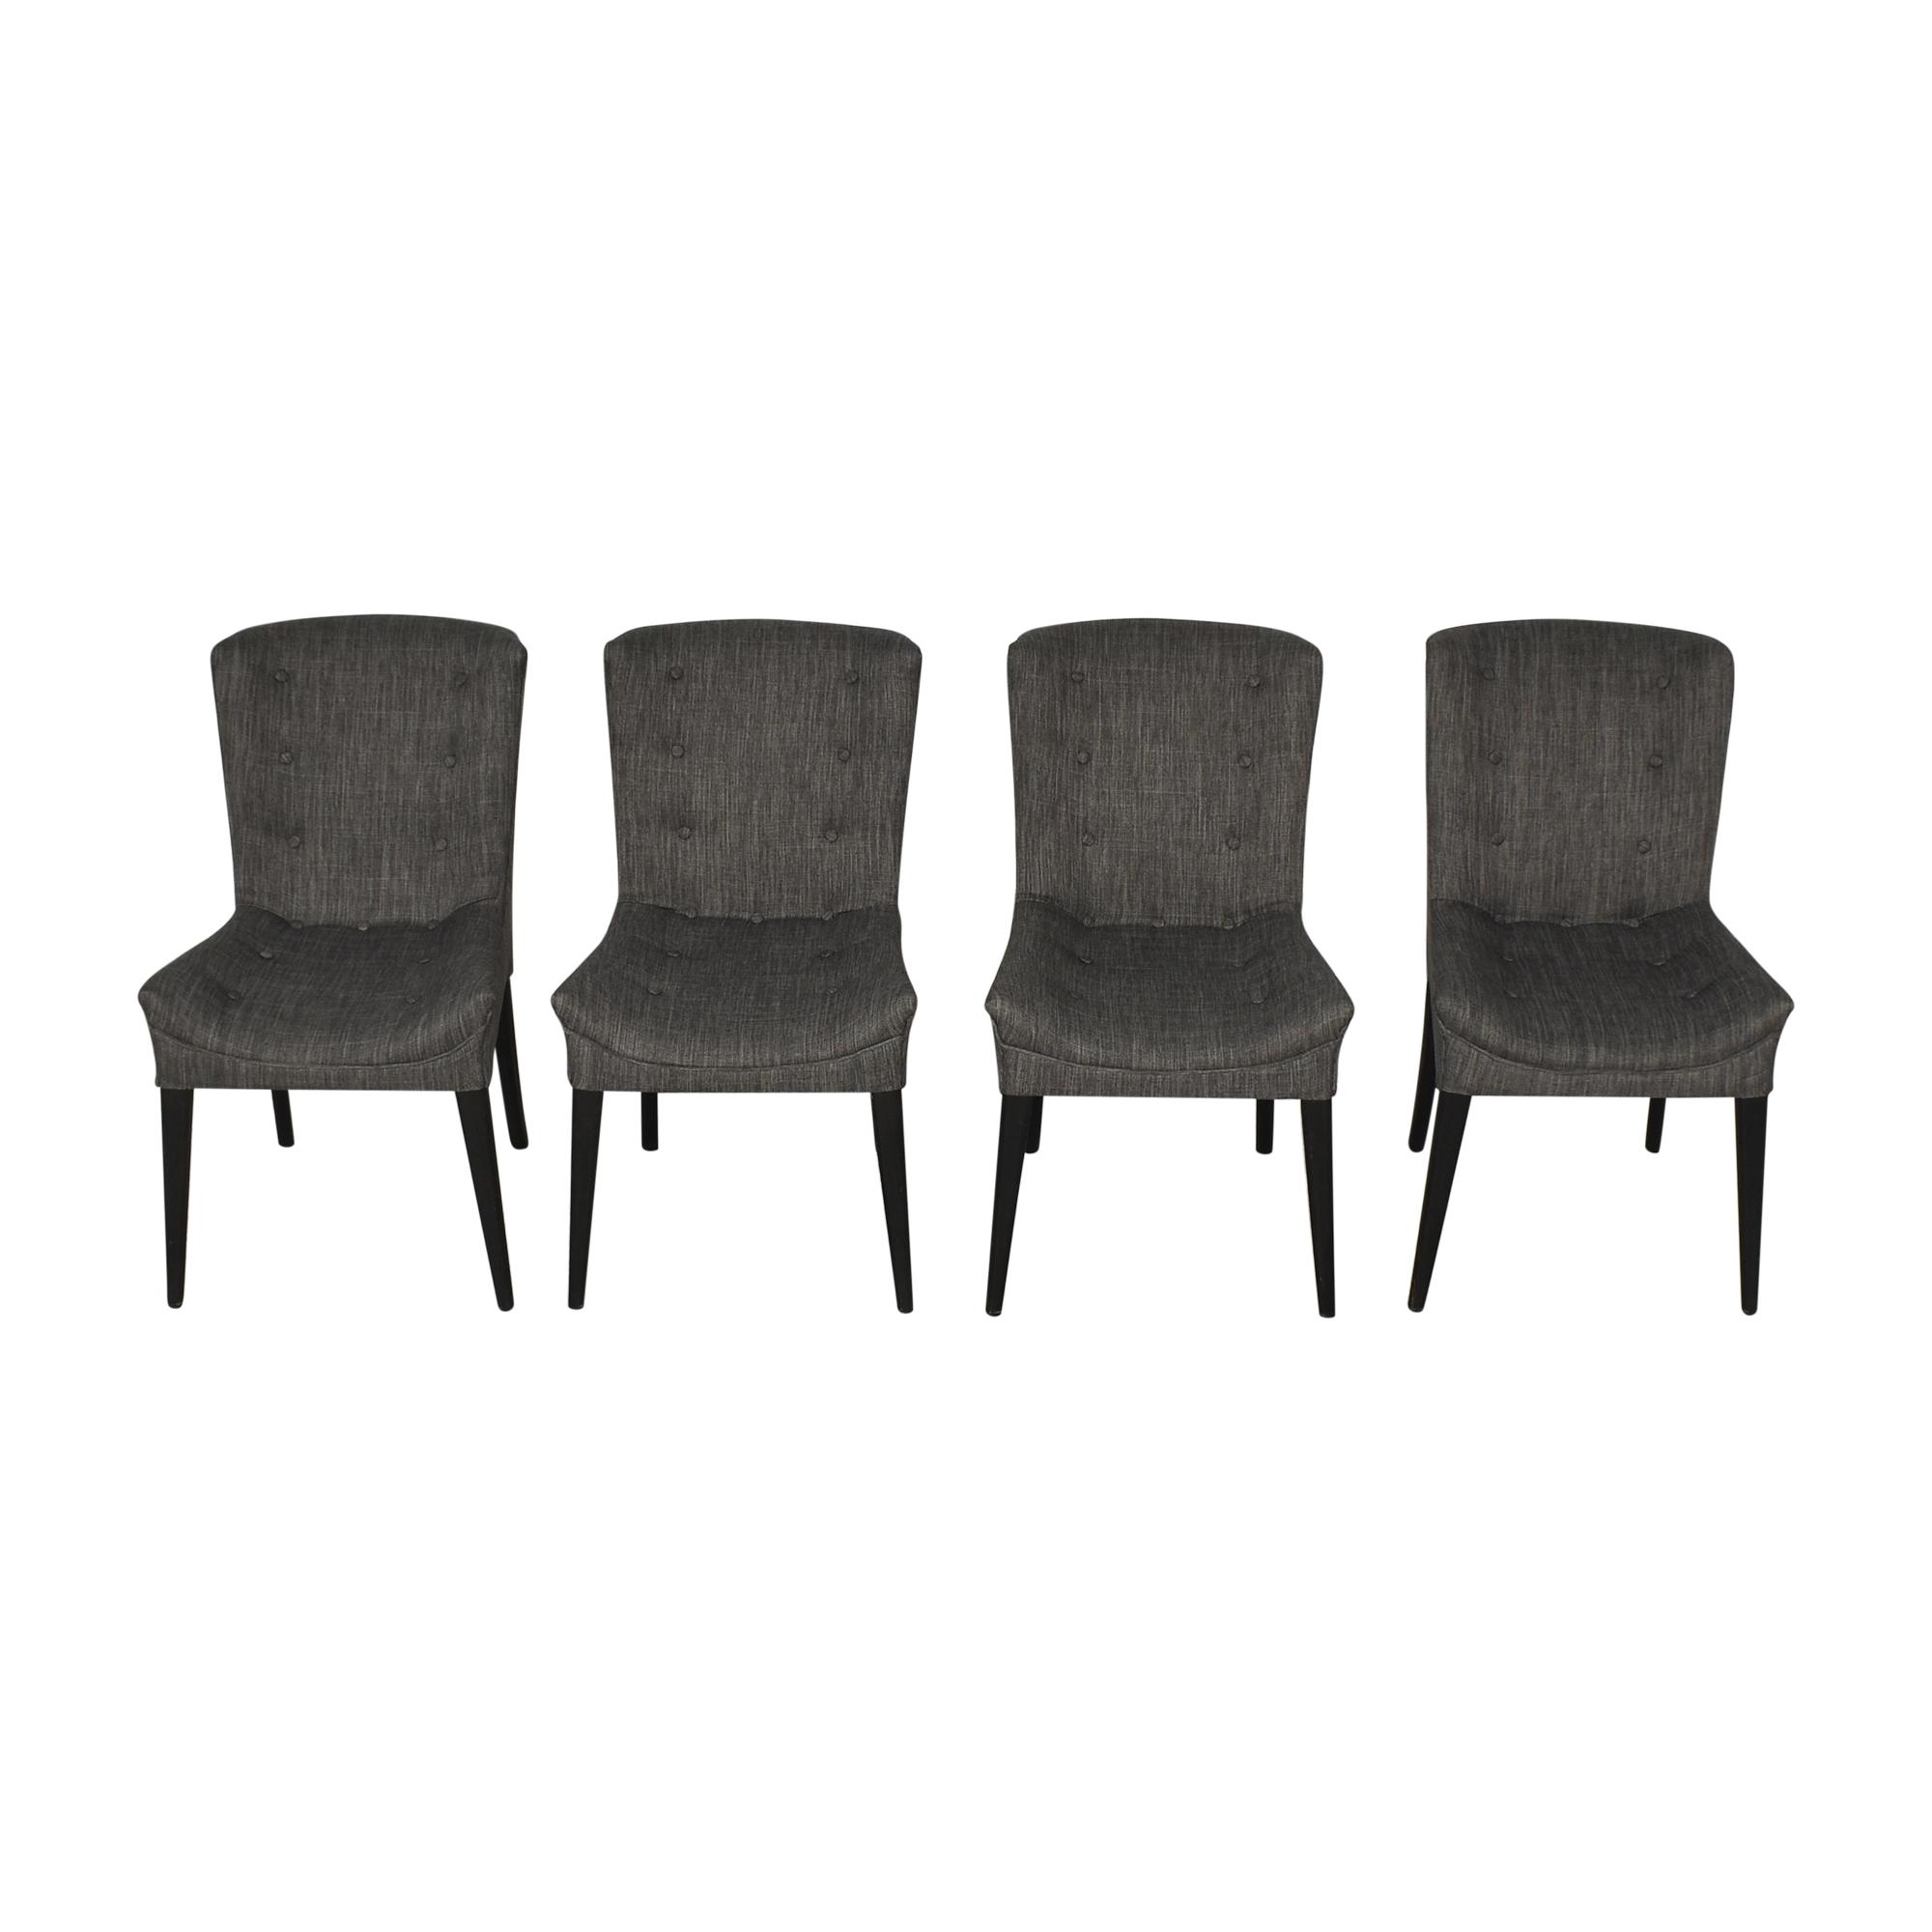 Arhaus Arhaus Grammercy Dining Side Chairs nyc